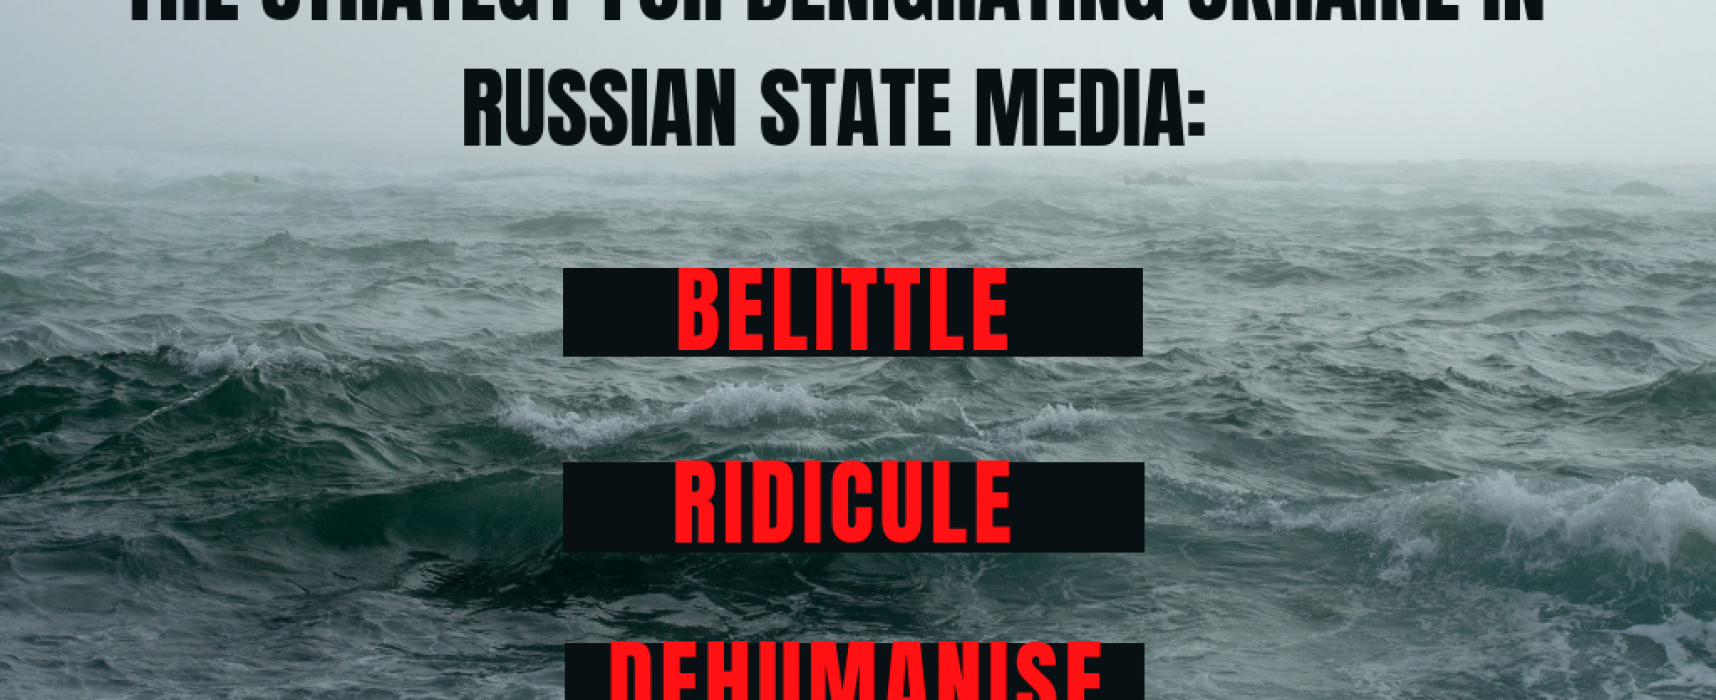 Denigrating Ukraine with disinformation